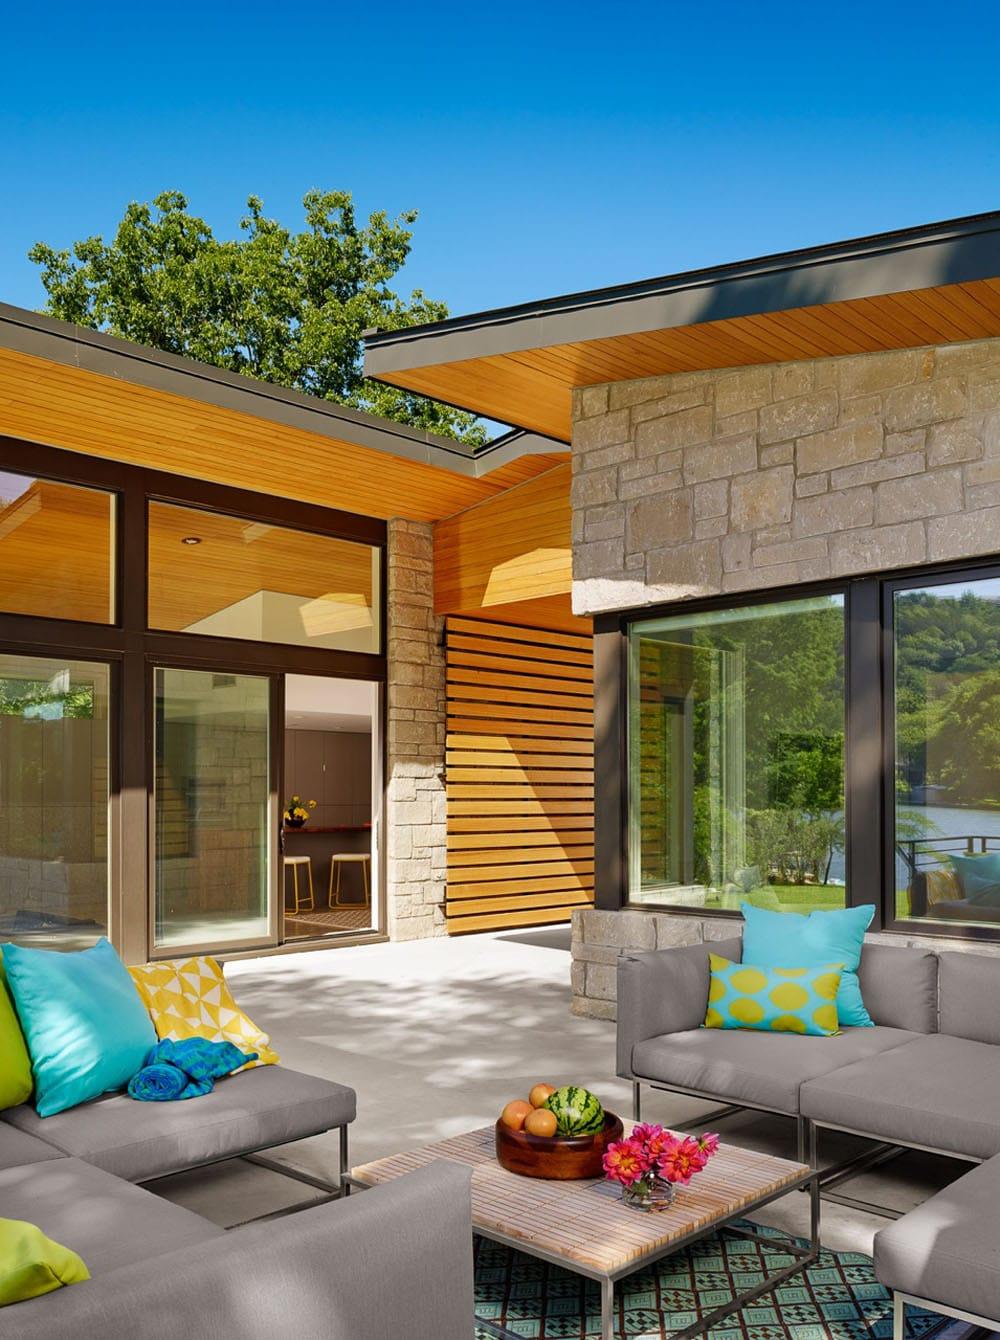 Dise o de casa de un piso con fachada en piedra y madera - Casas de madera diseno moderno ...